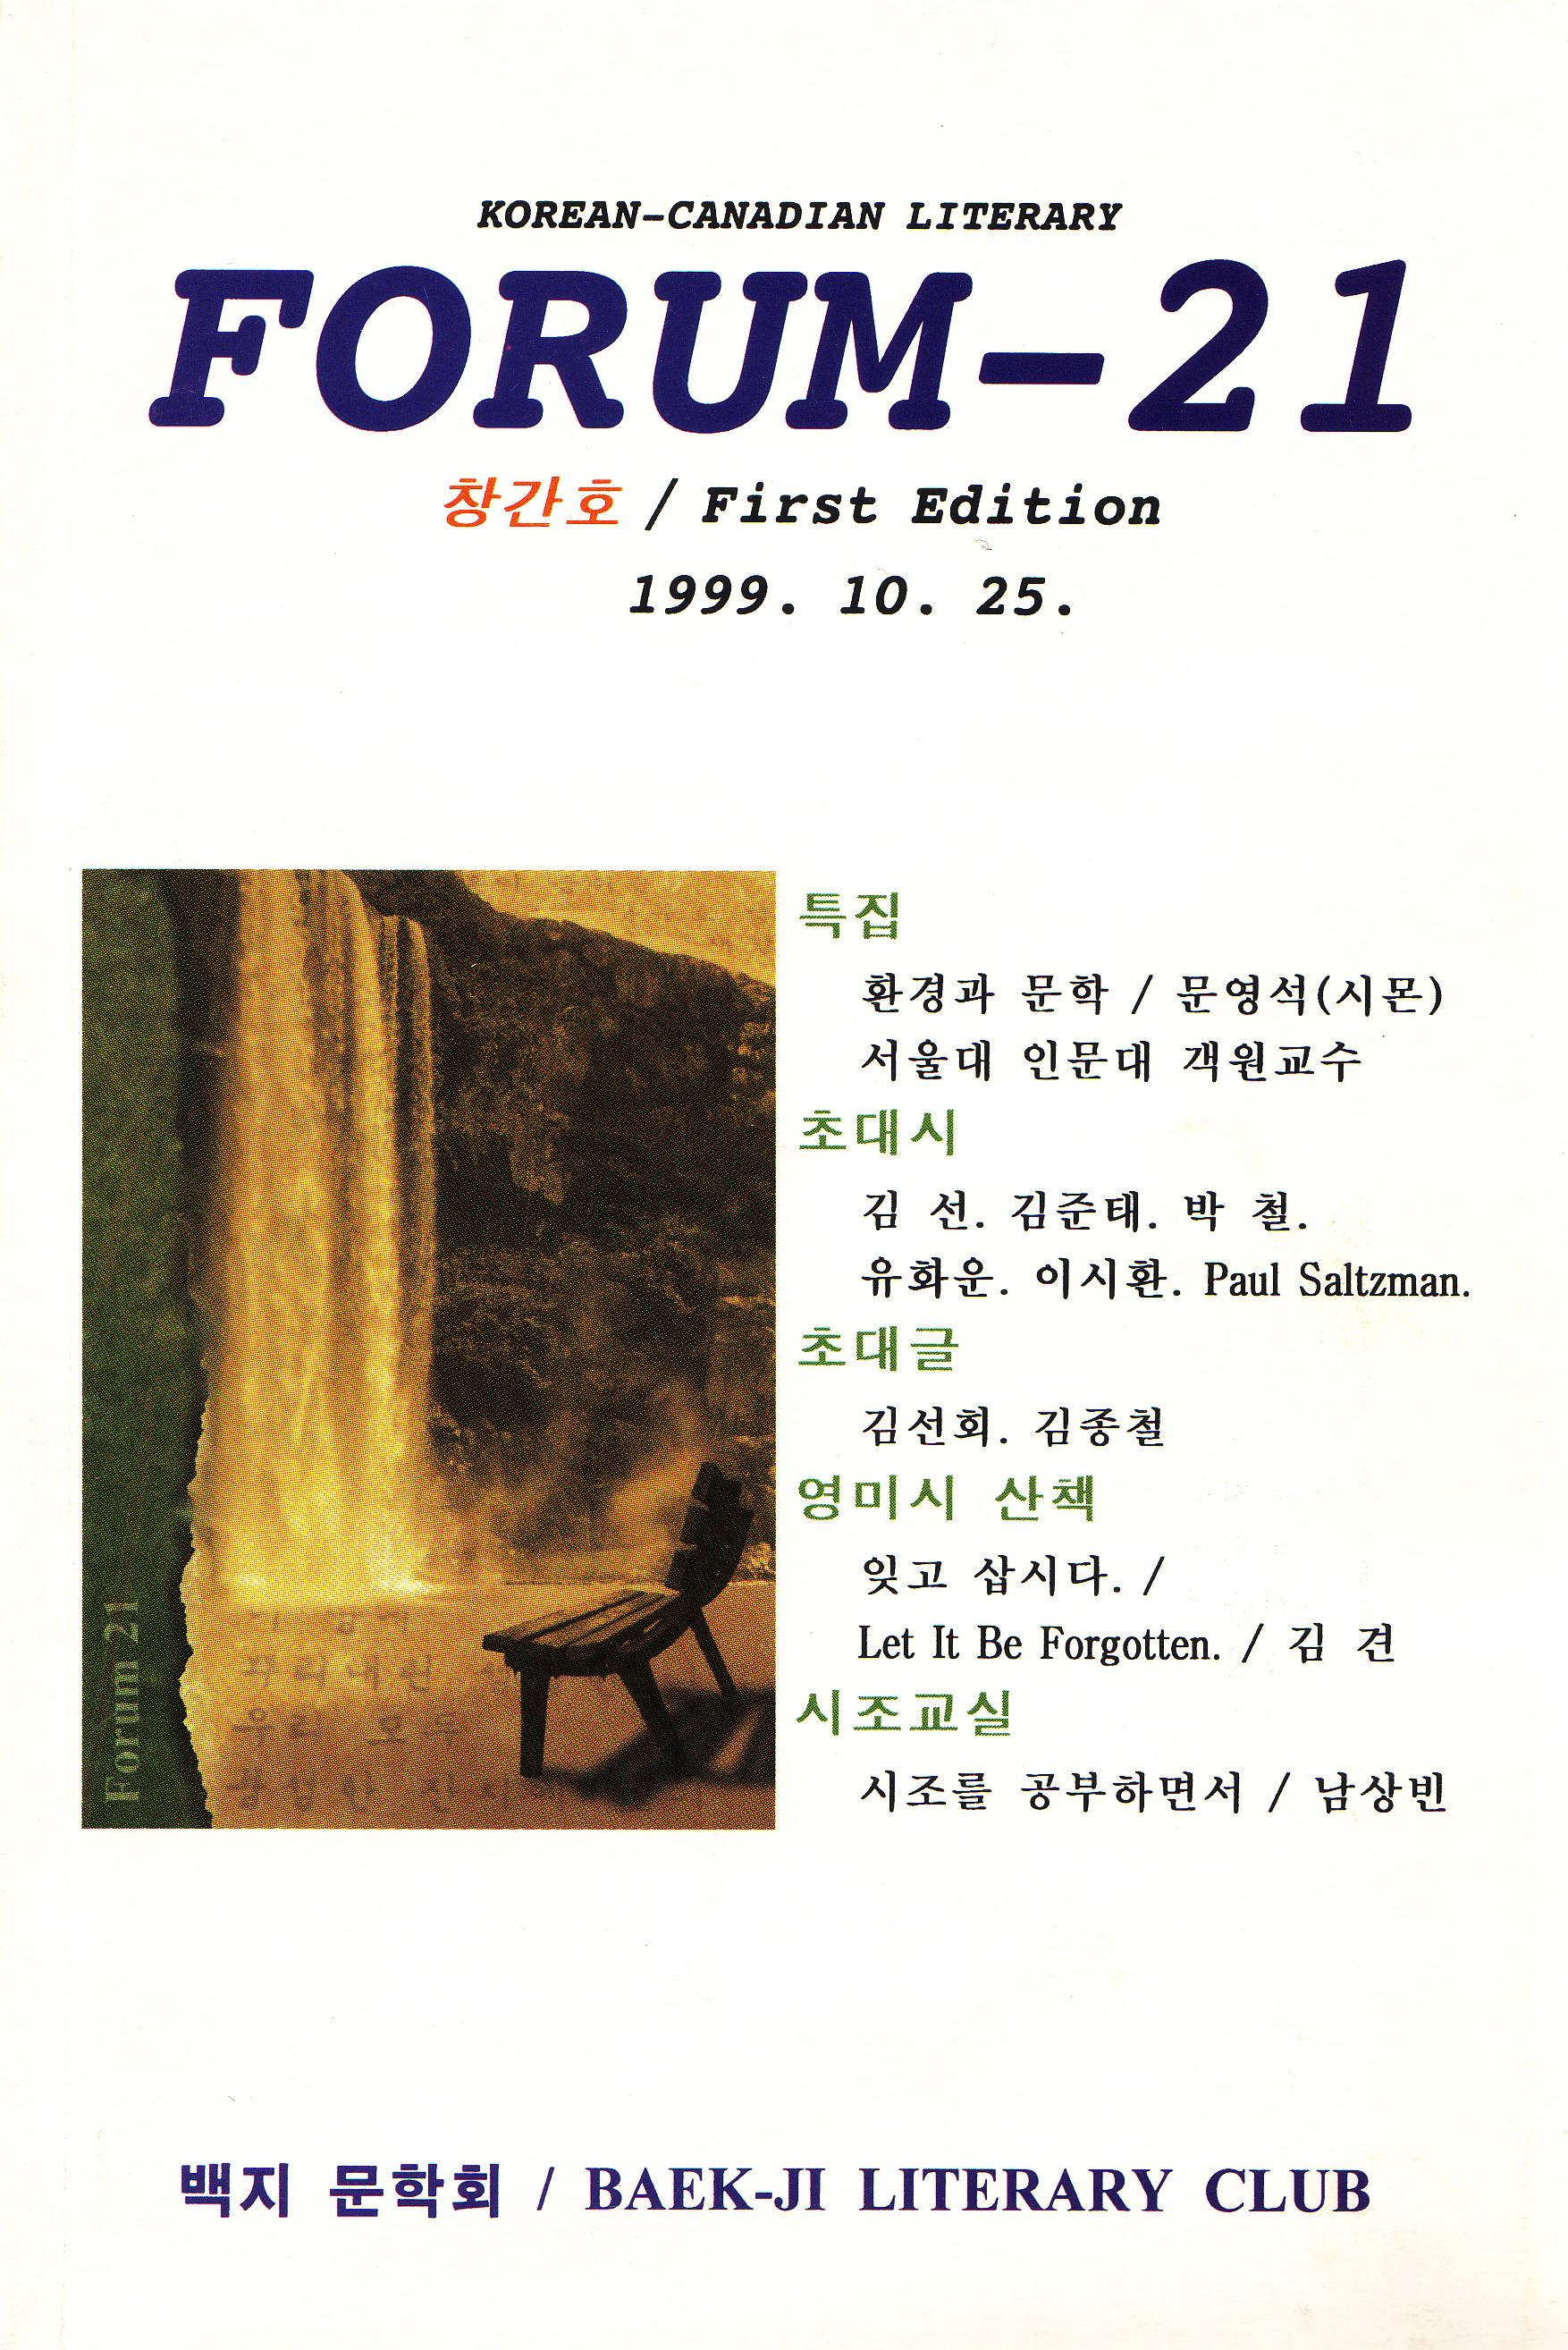 Korean Canadian Literary Forum-21